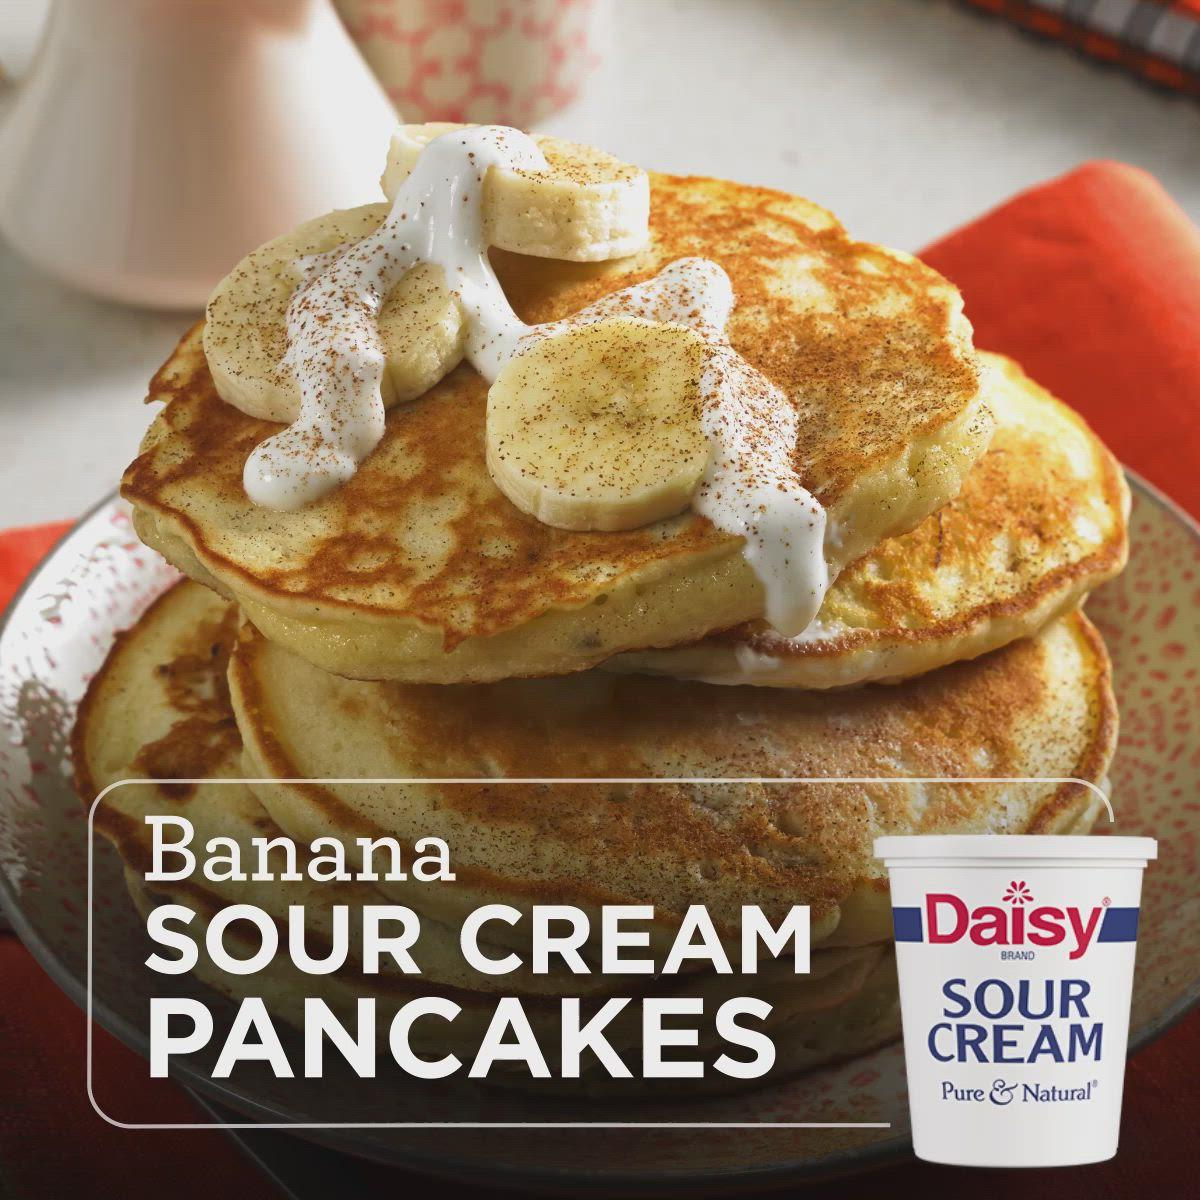 Banana Sour Cream Pancakes Video In 2020 Sour Cream Pancakes Breakfast Brunch Recipes Food Recipies